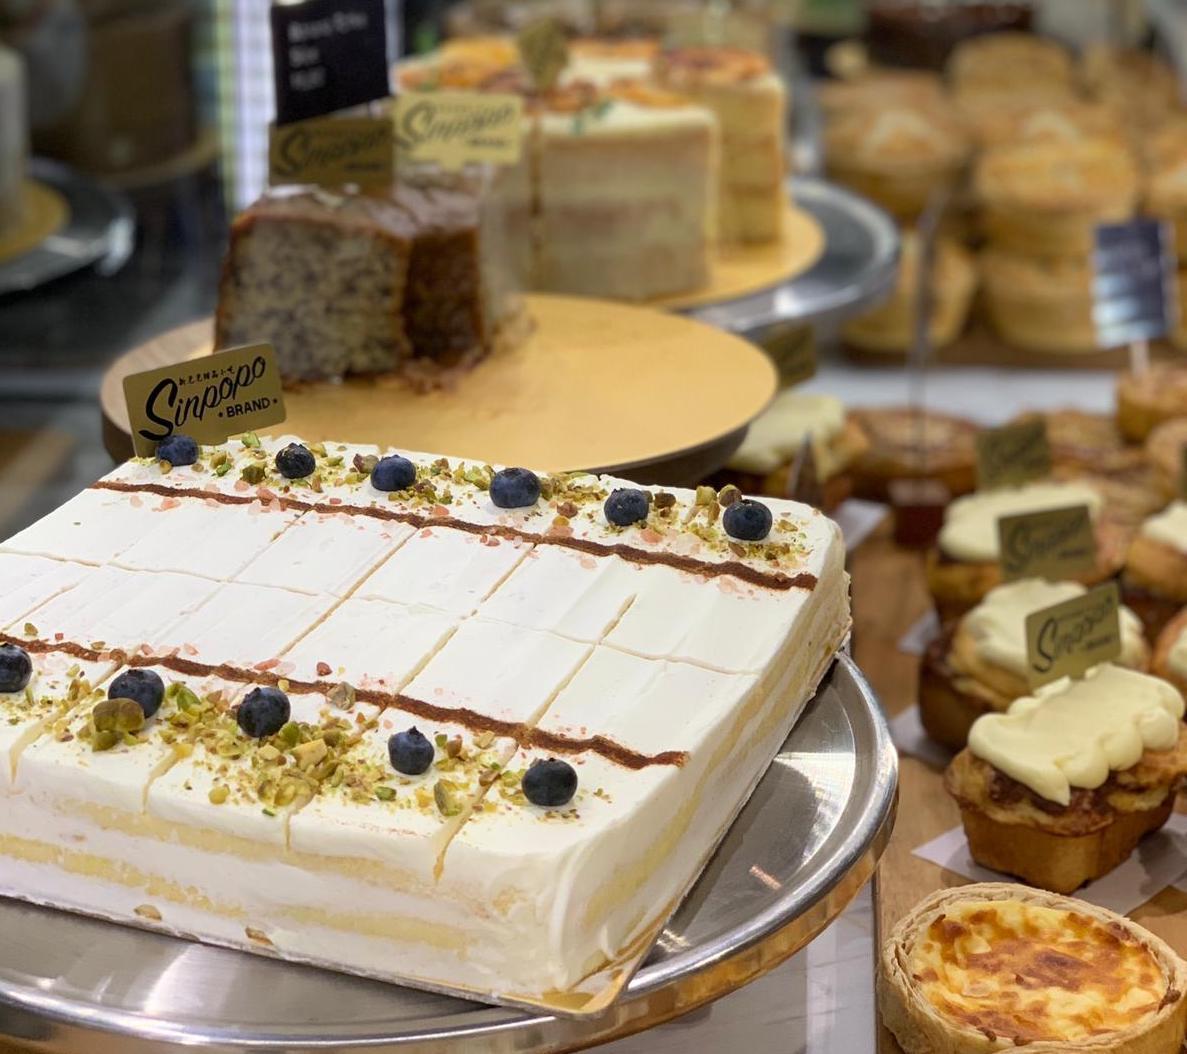 Sinpopo Brand Tres leches cake